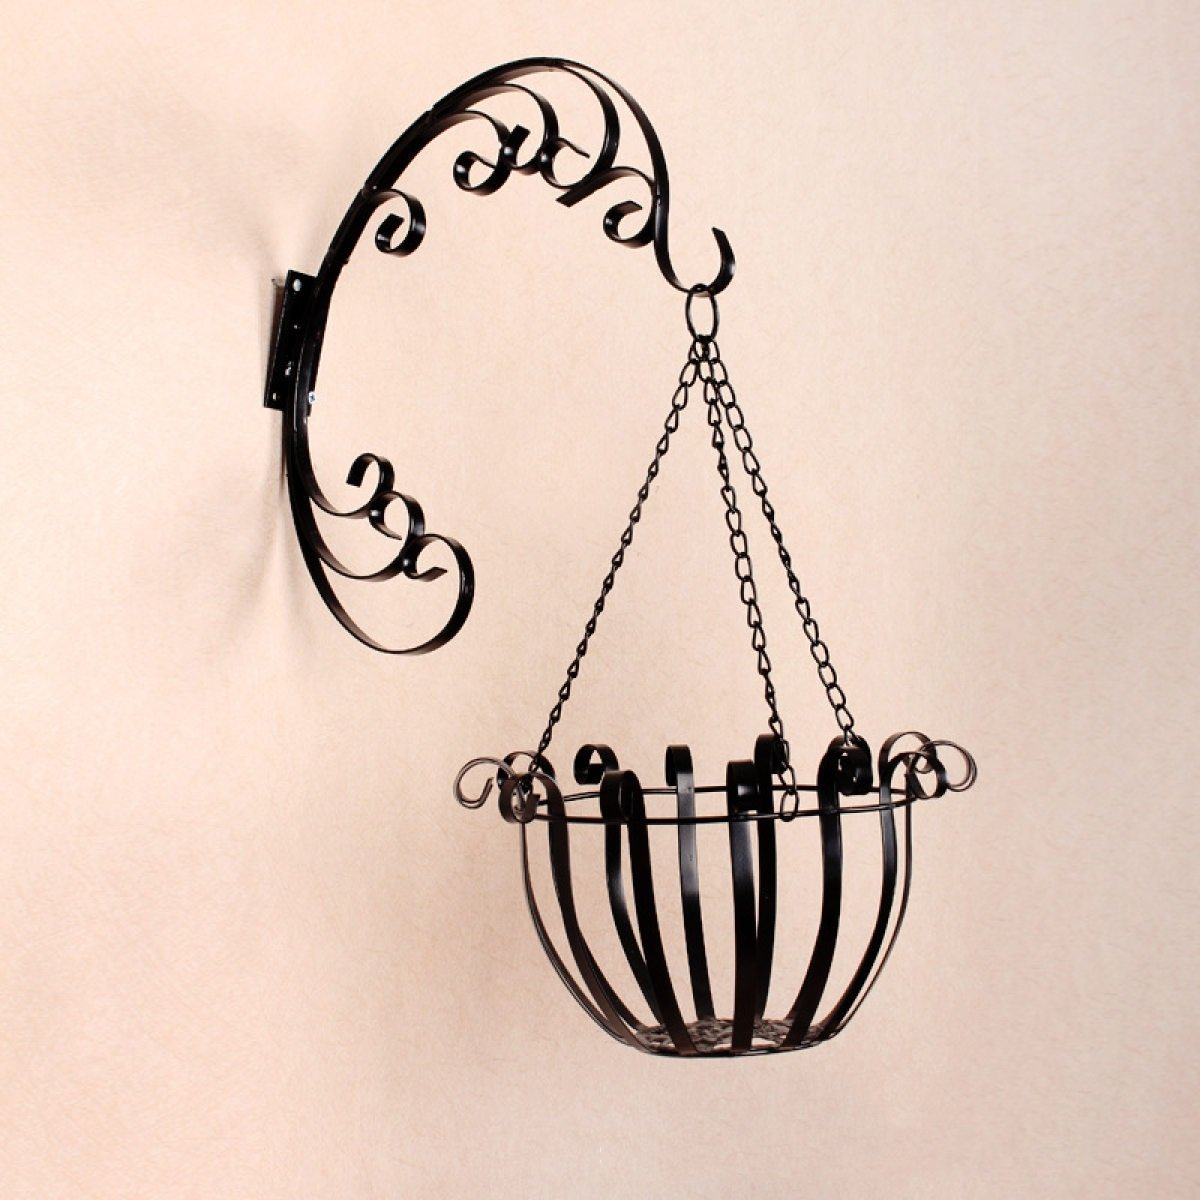 L;IAN Flower Pot Rack European Creative Hanging Wall Balcony Flower Stand